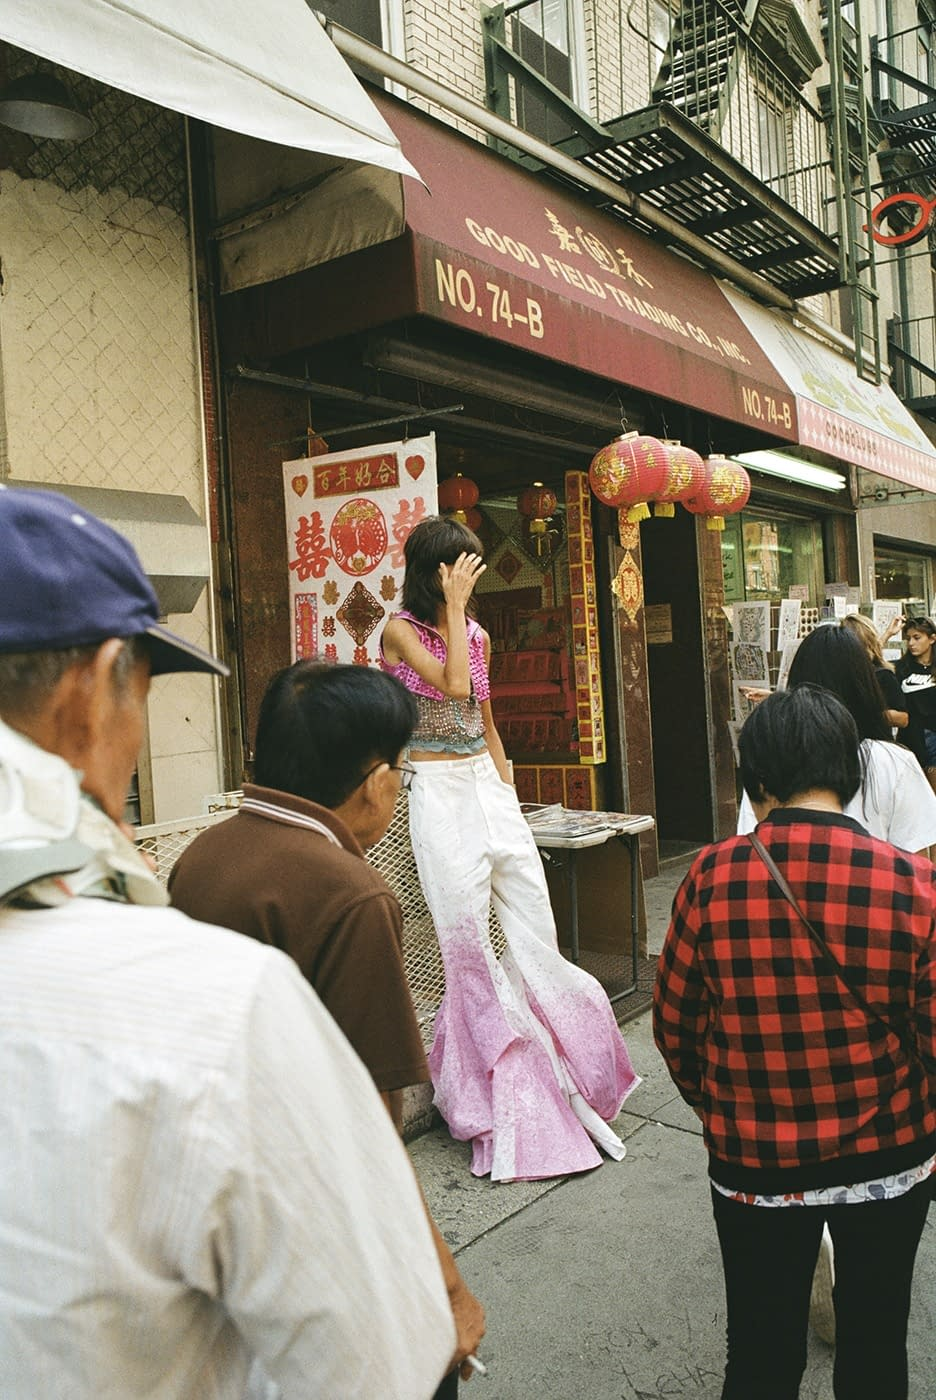 New York Stories 1 photo Enric Galceran - 04